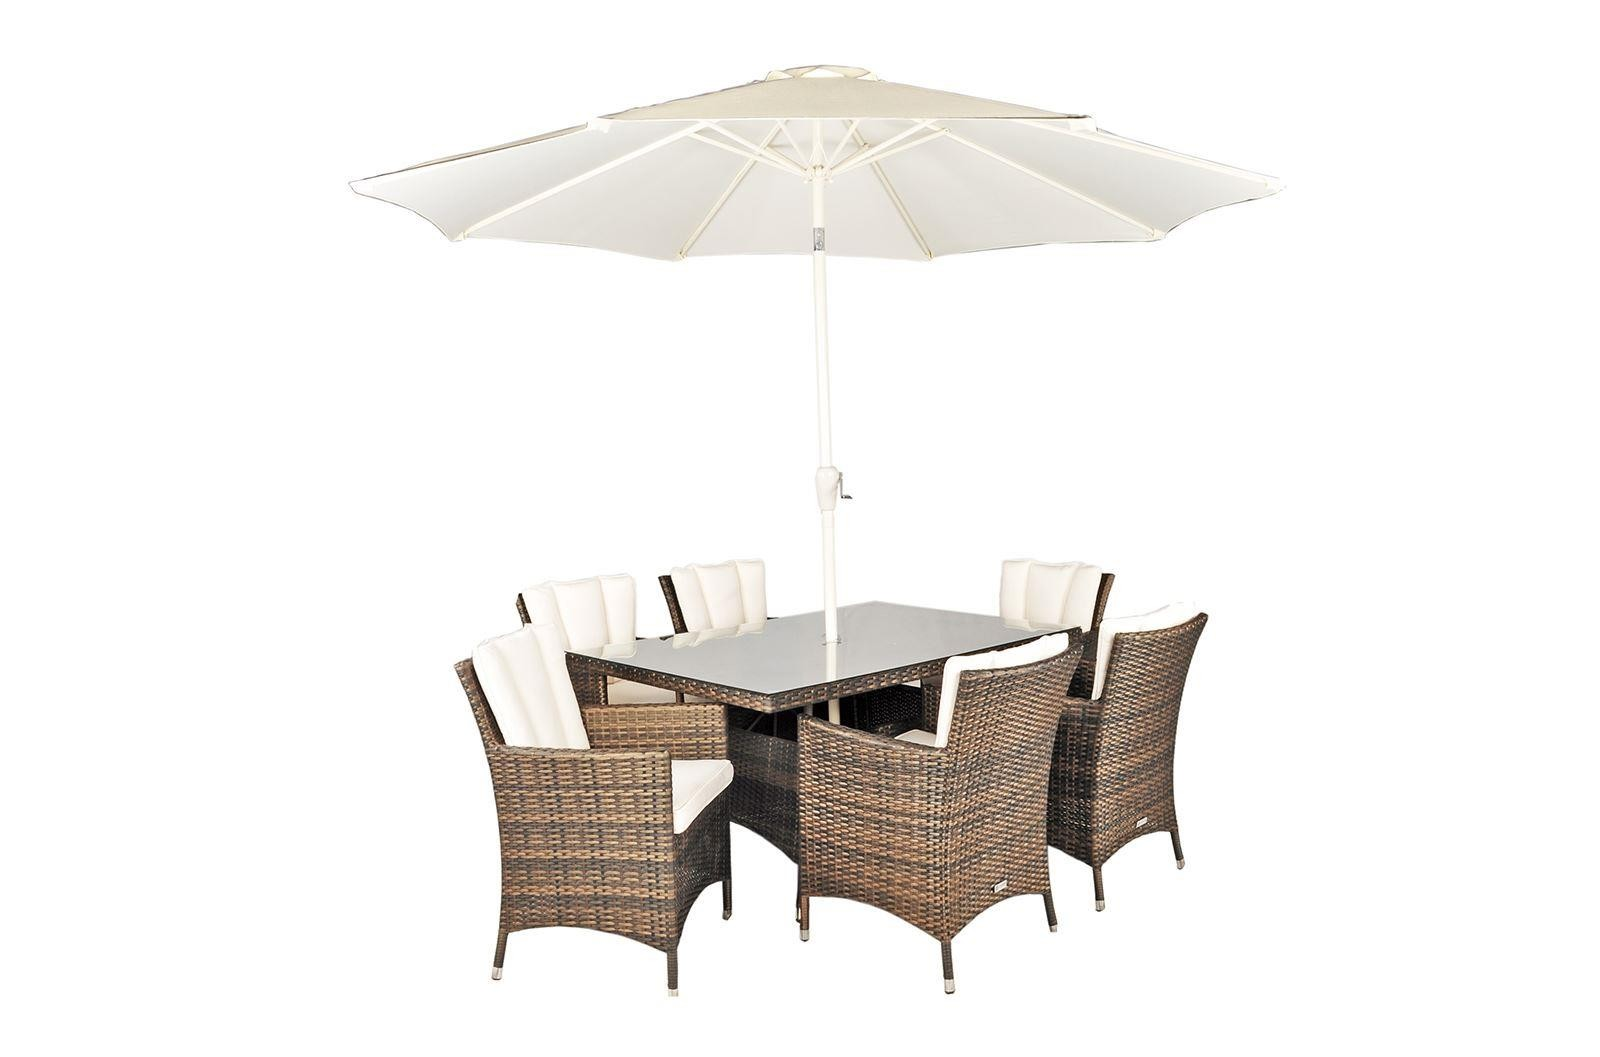 Savannah Rattan Garden Furniture [6 Seat Dining Set with Rectangular Table]